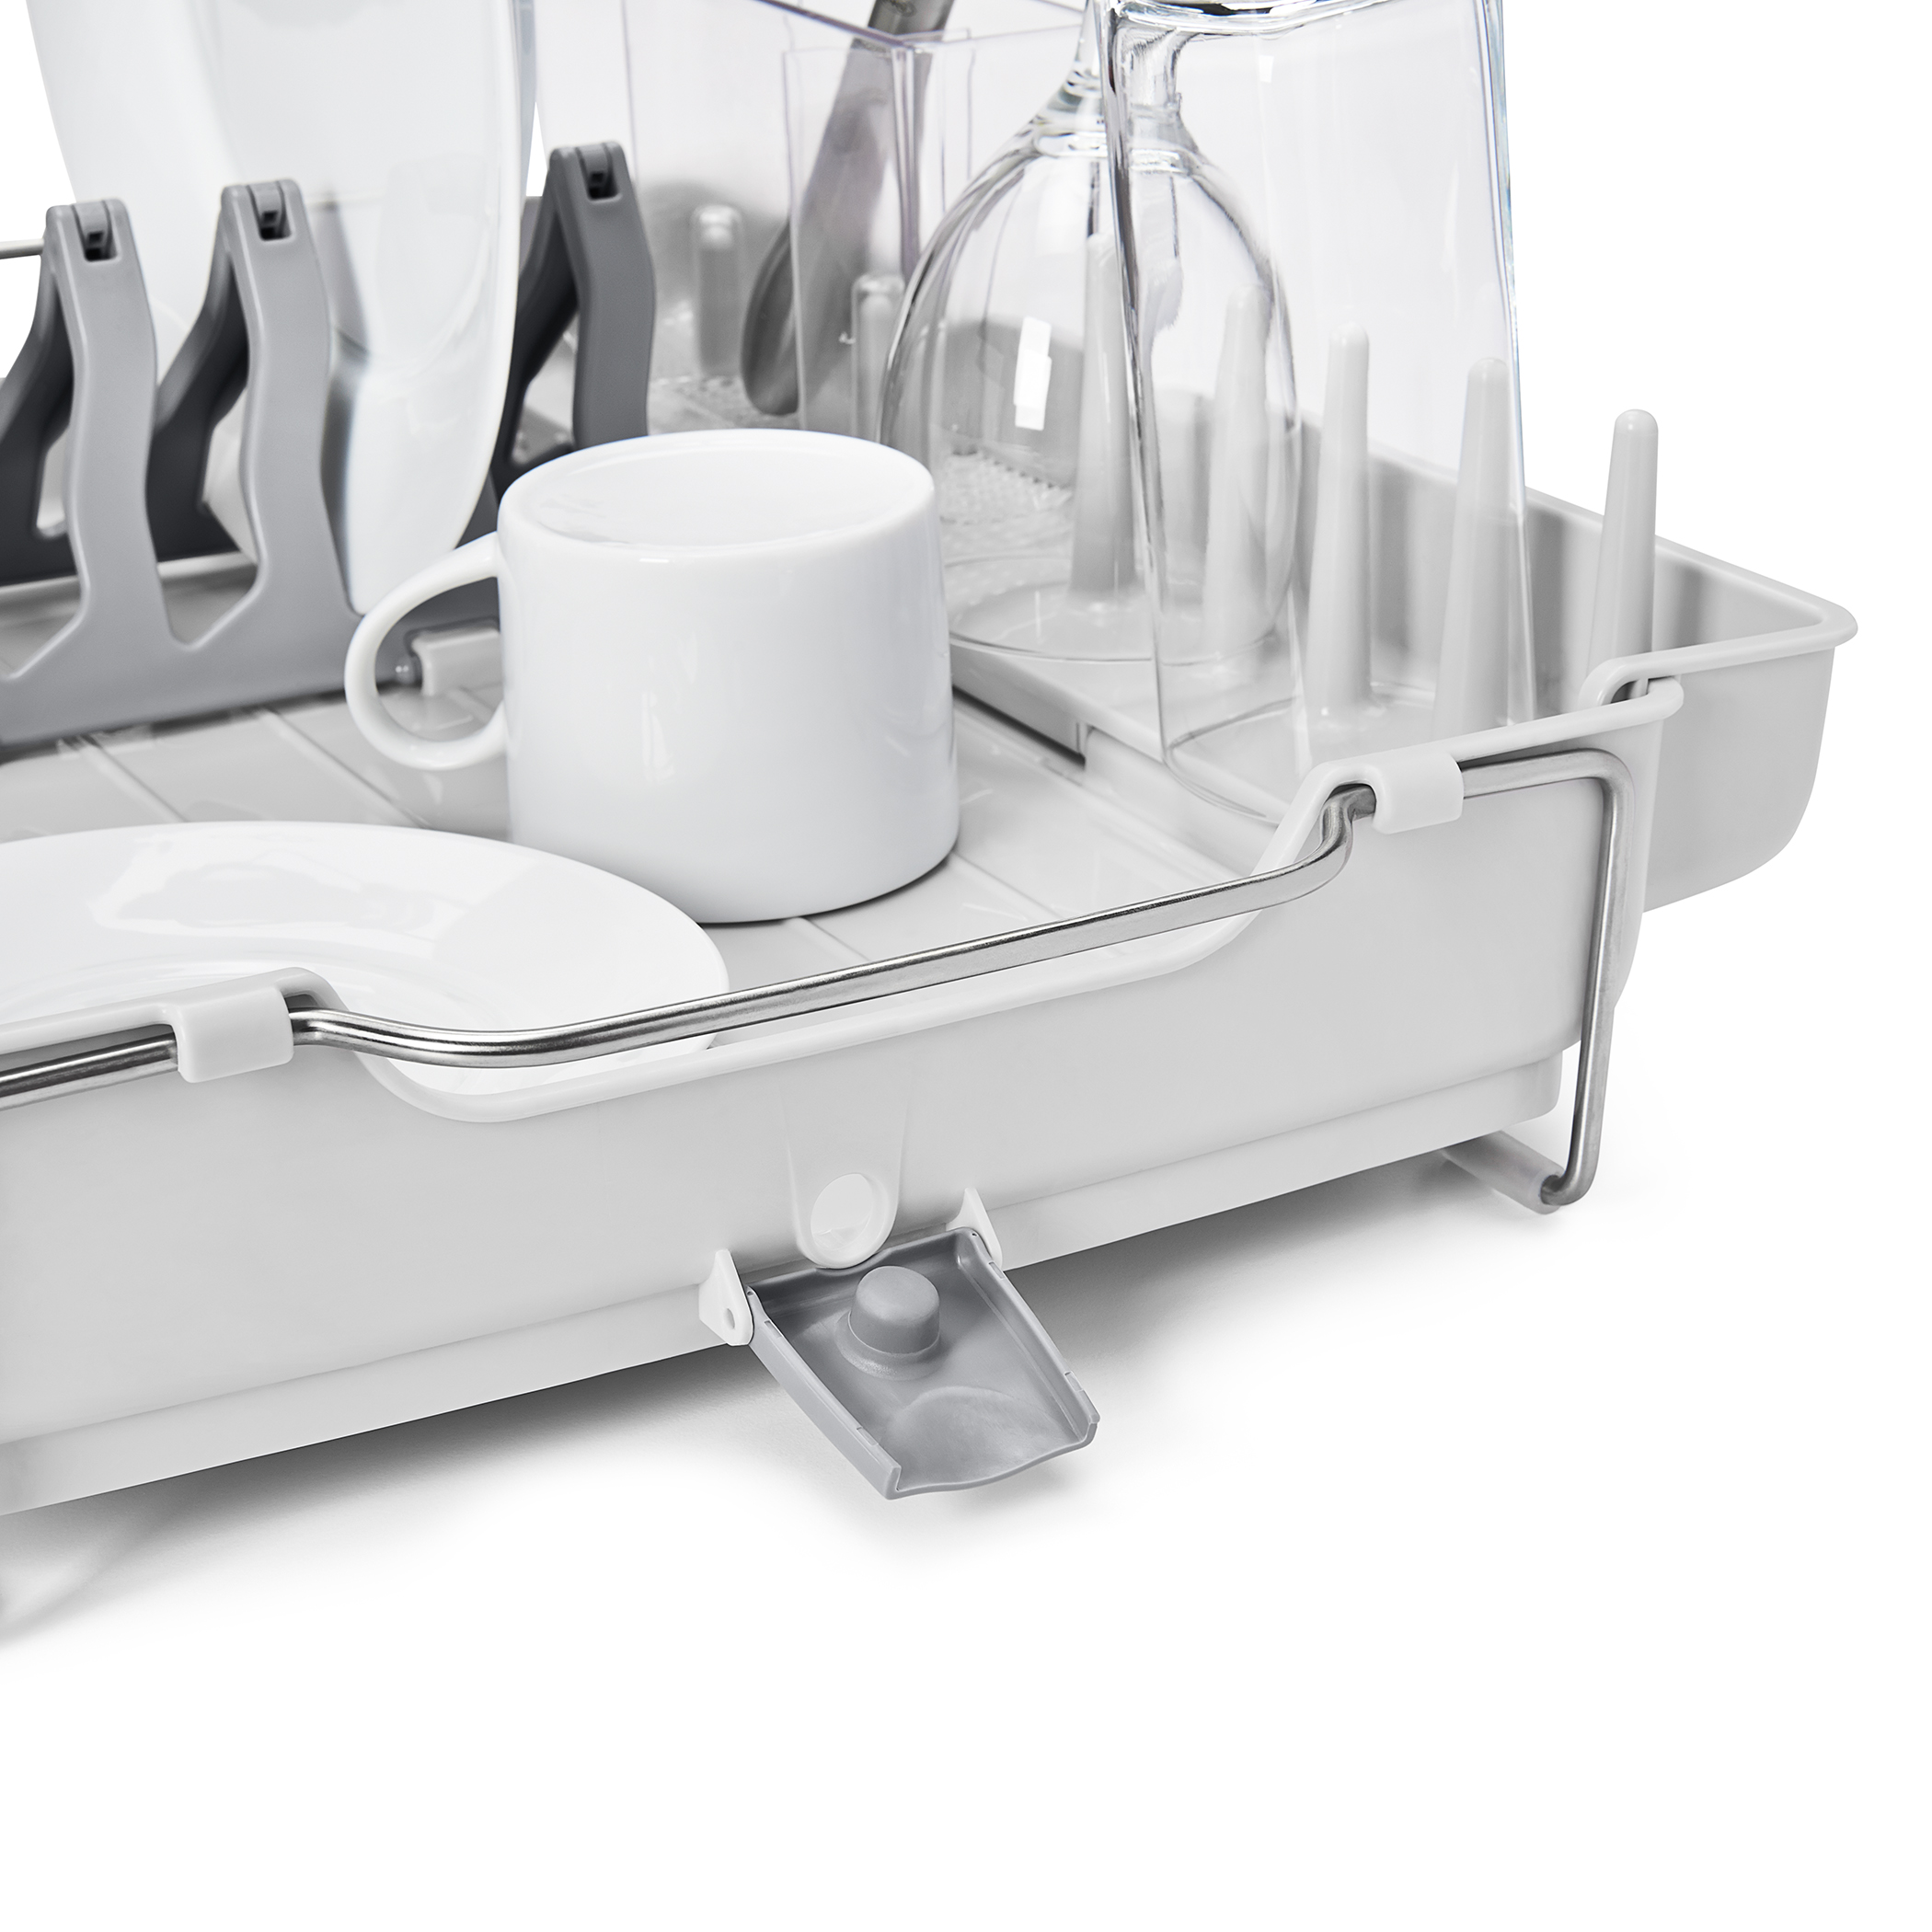 oxo airstream foldaway dish rack_7a